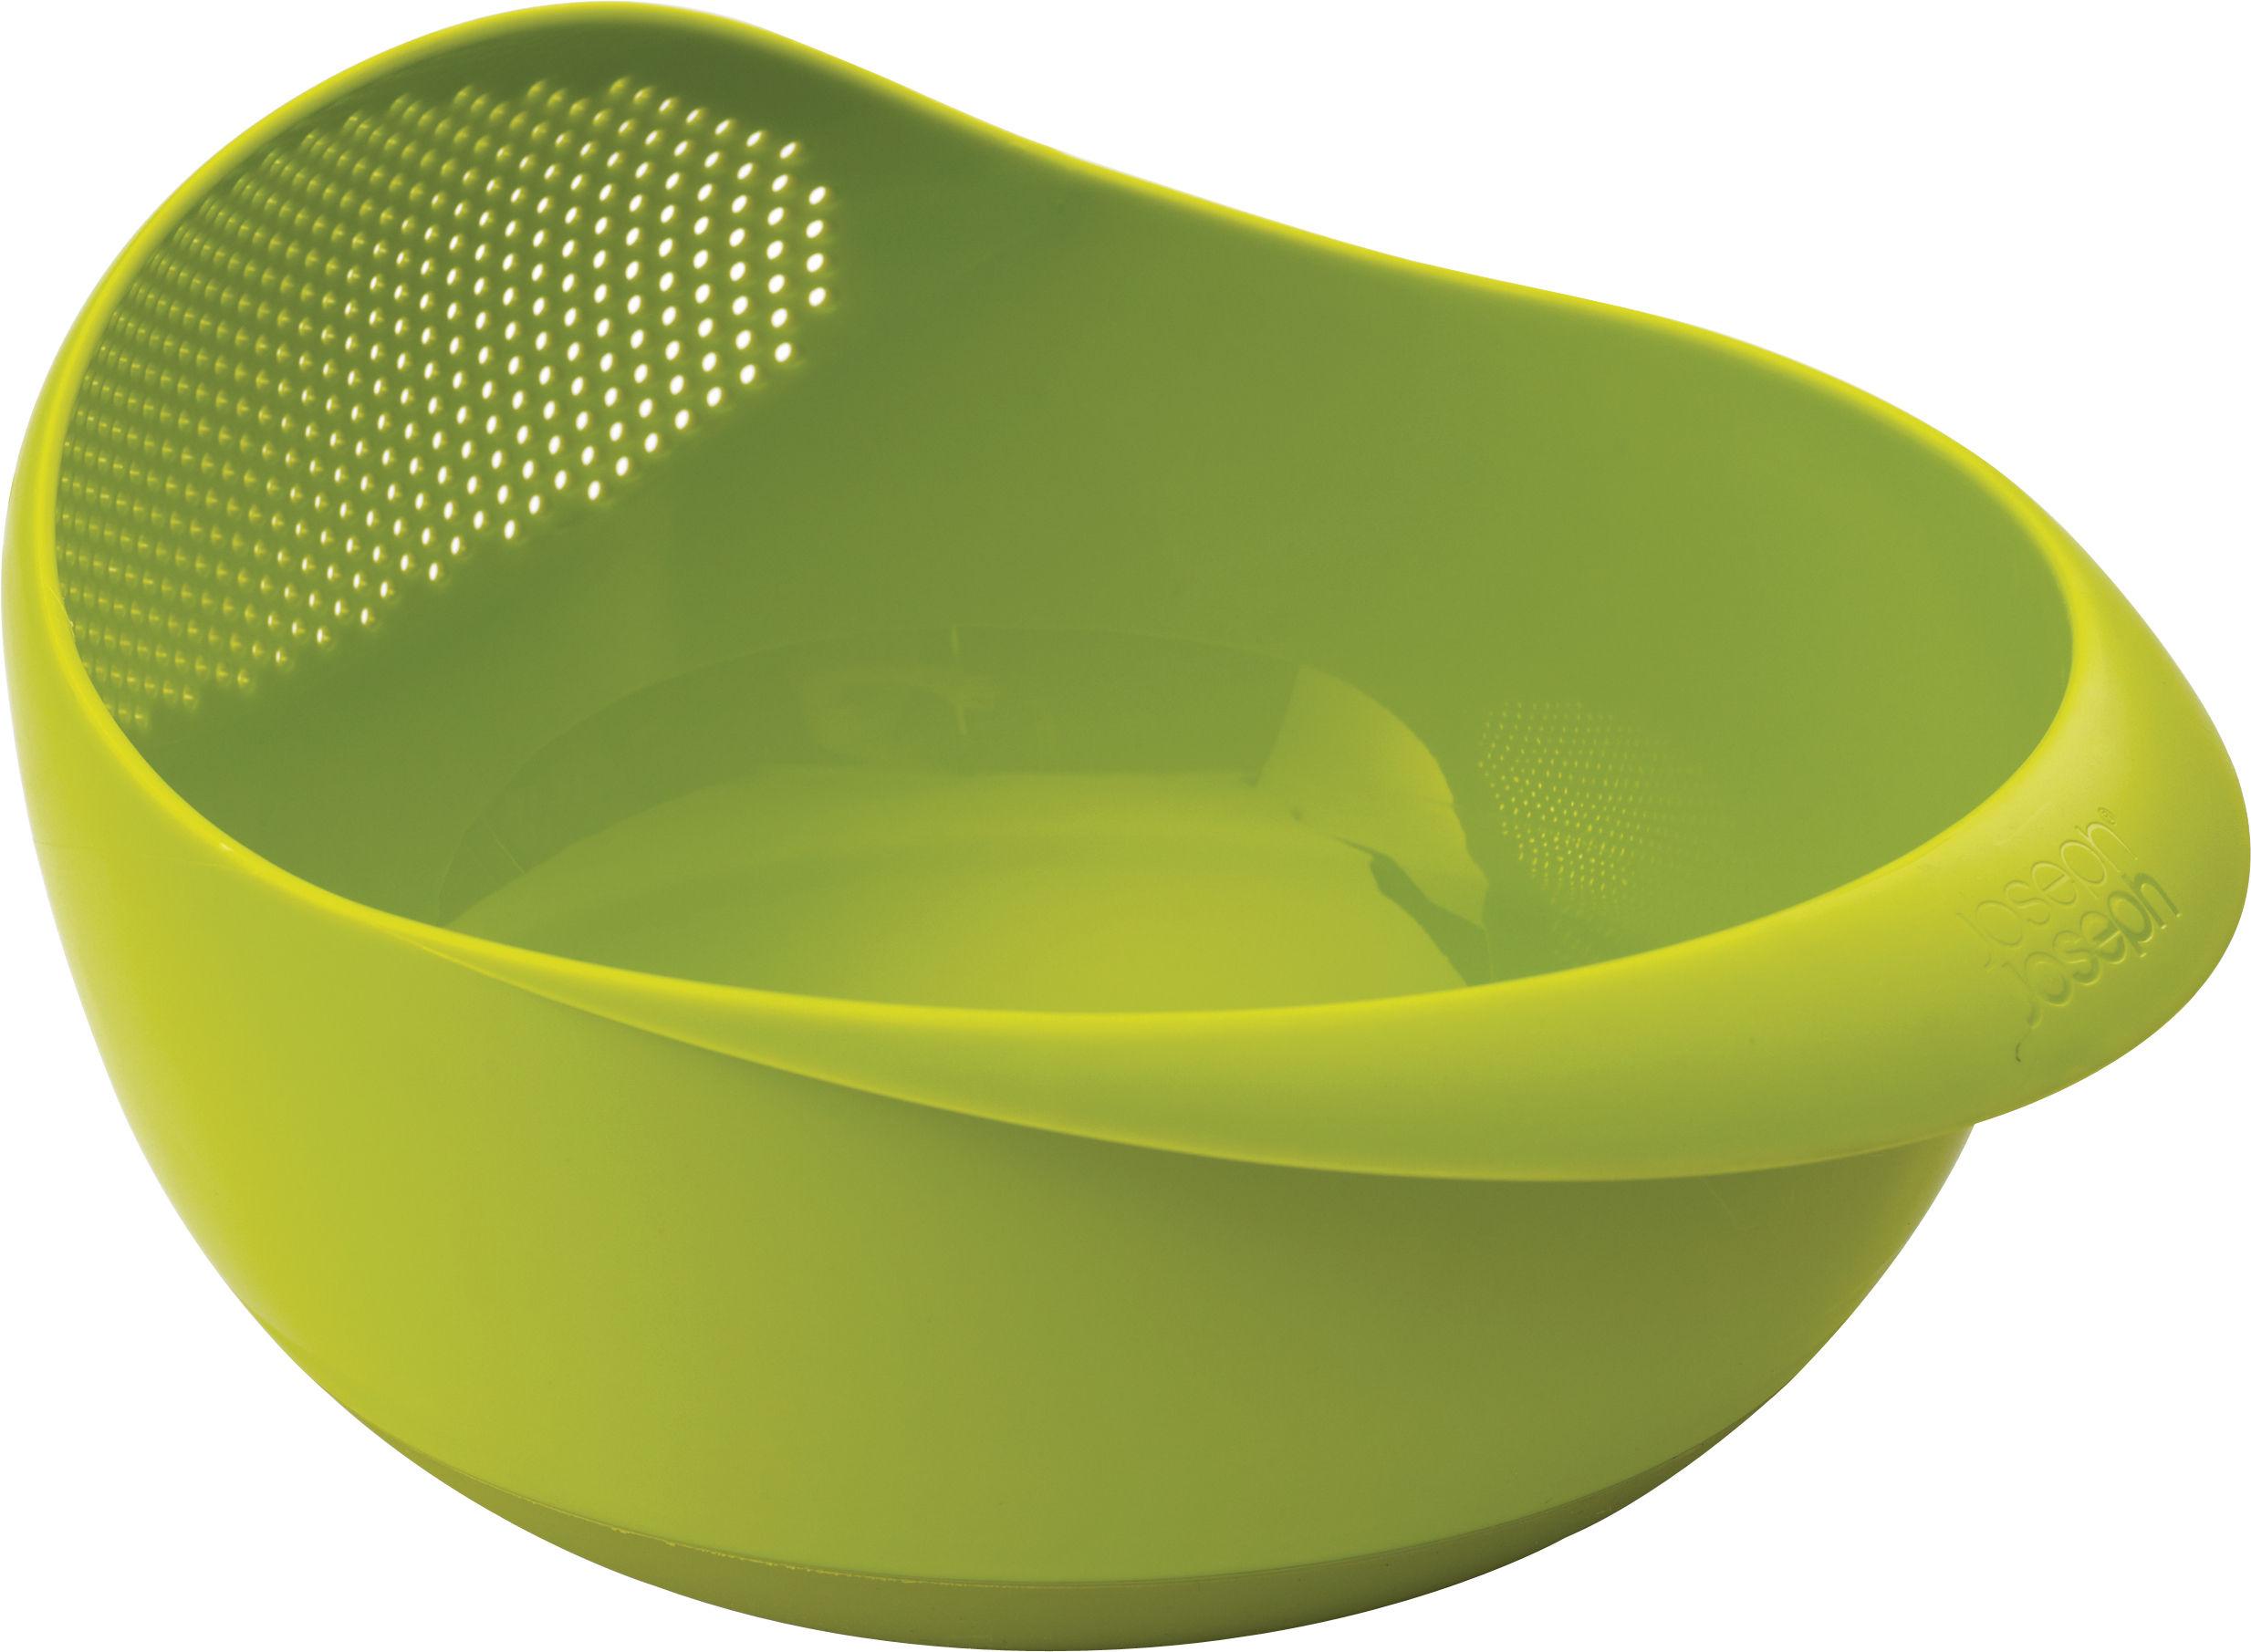 Tableware - Bowls - Prep&Serve Salad bowl by Joseph Joseph - Green - Polypropylene